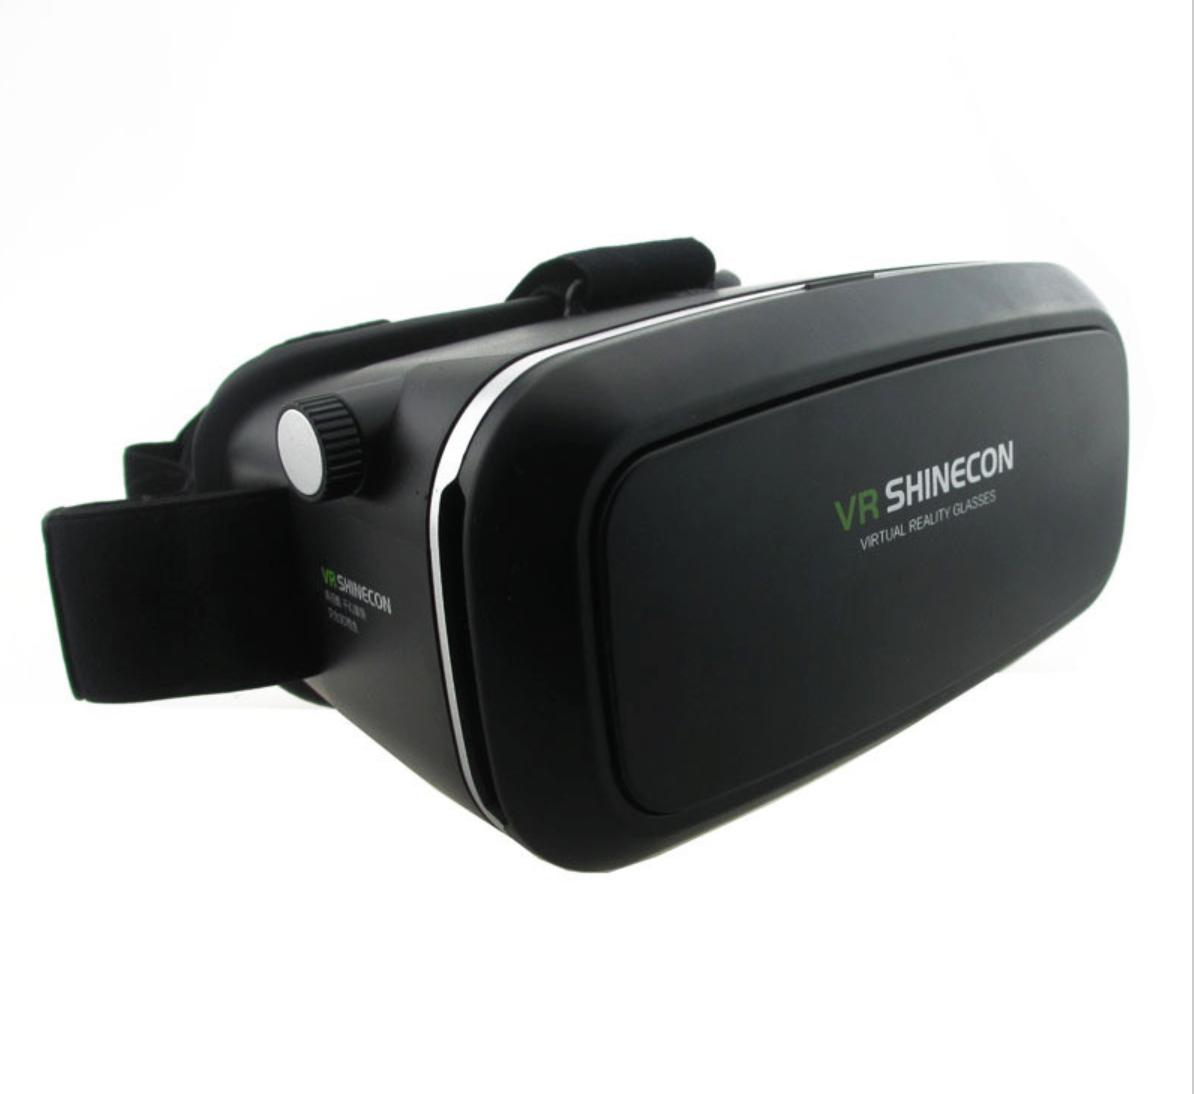 VR Shinecon VR Virtual Reality 3D Glasses Headband Oculus